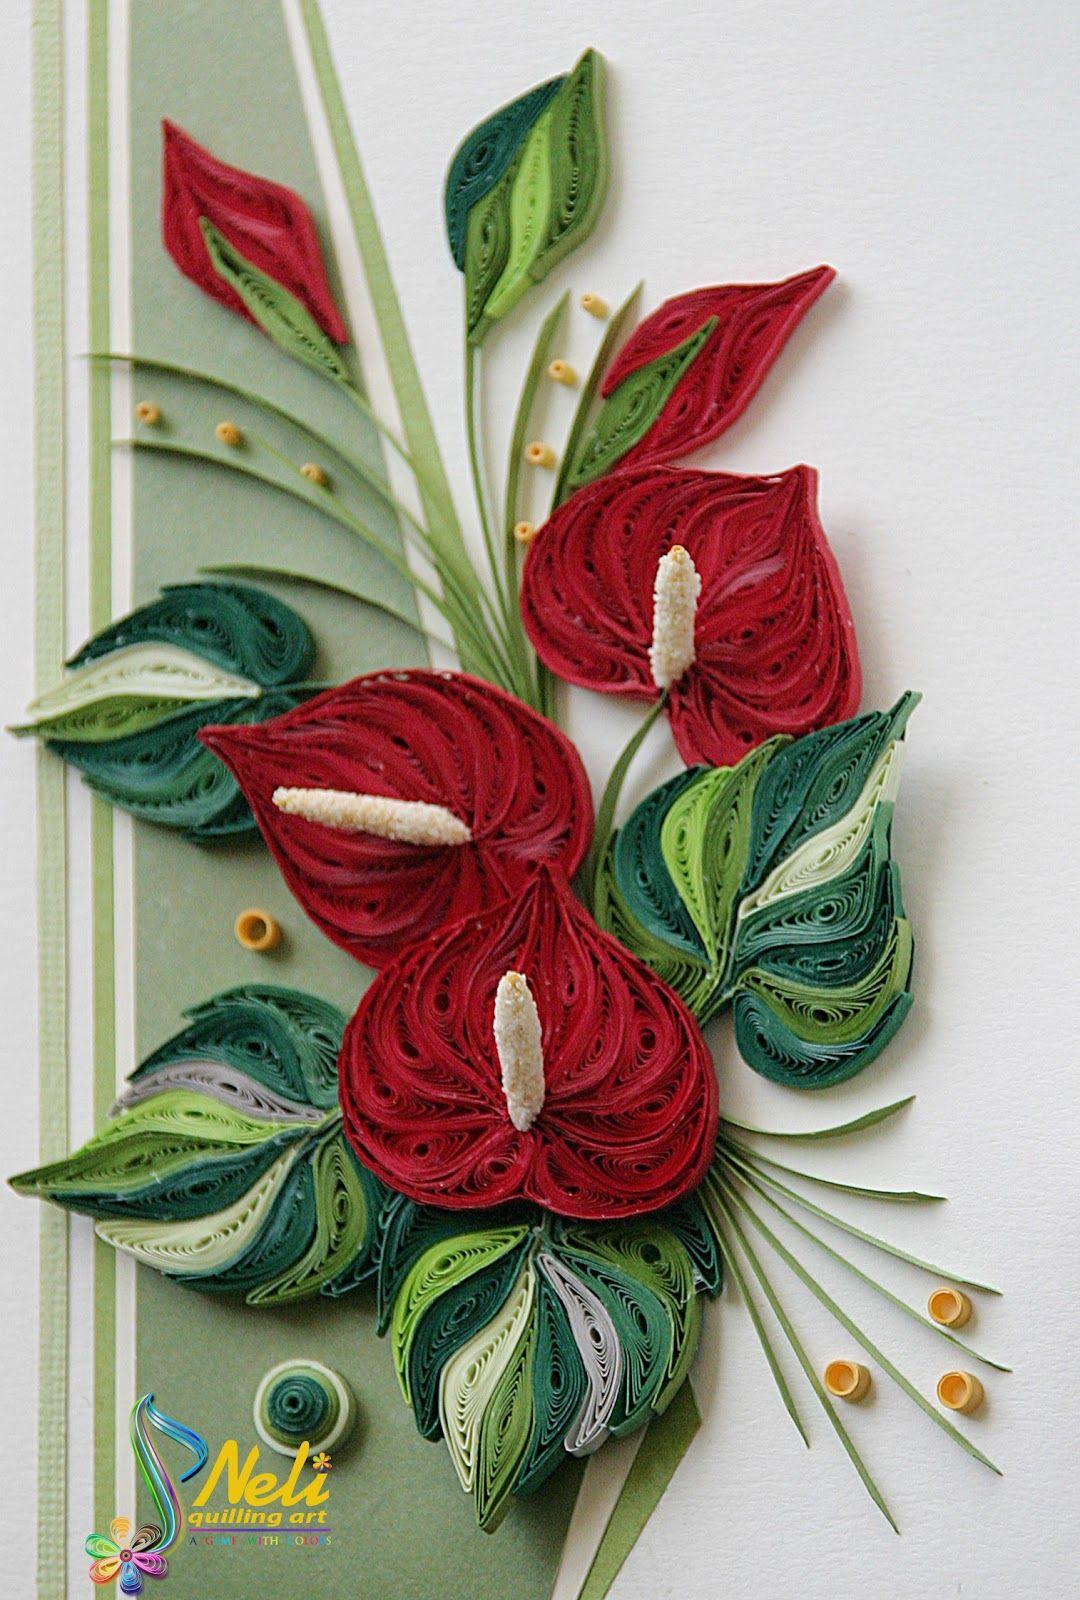 Neli Quilling Art Anthurium Bouquet Paper Quilling Pinte